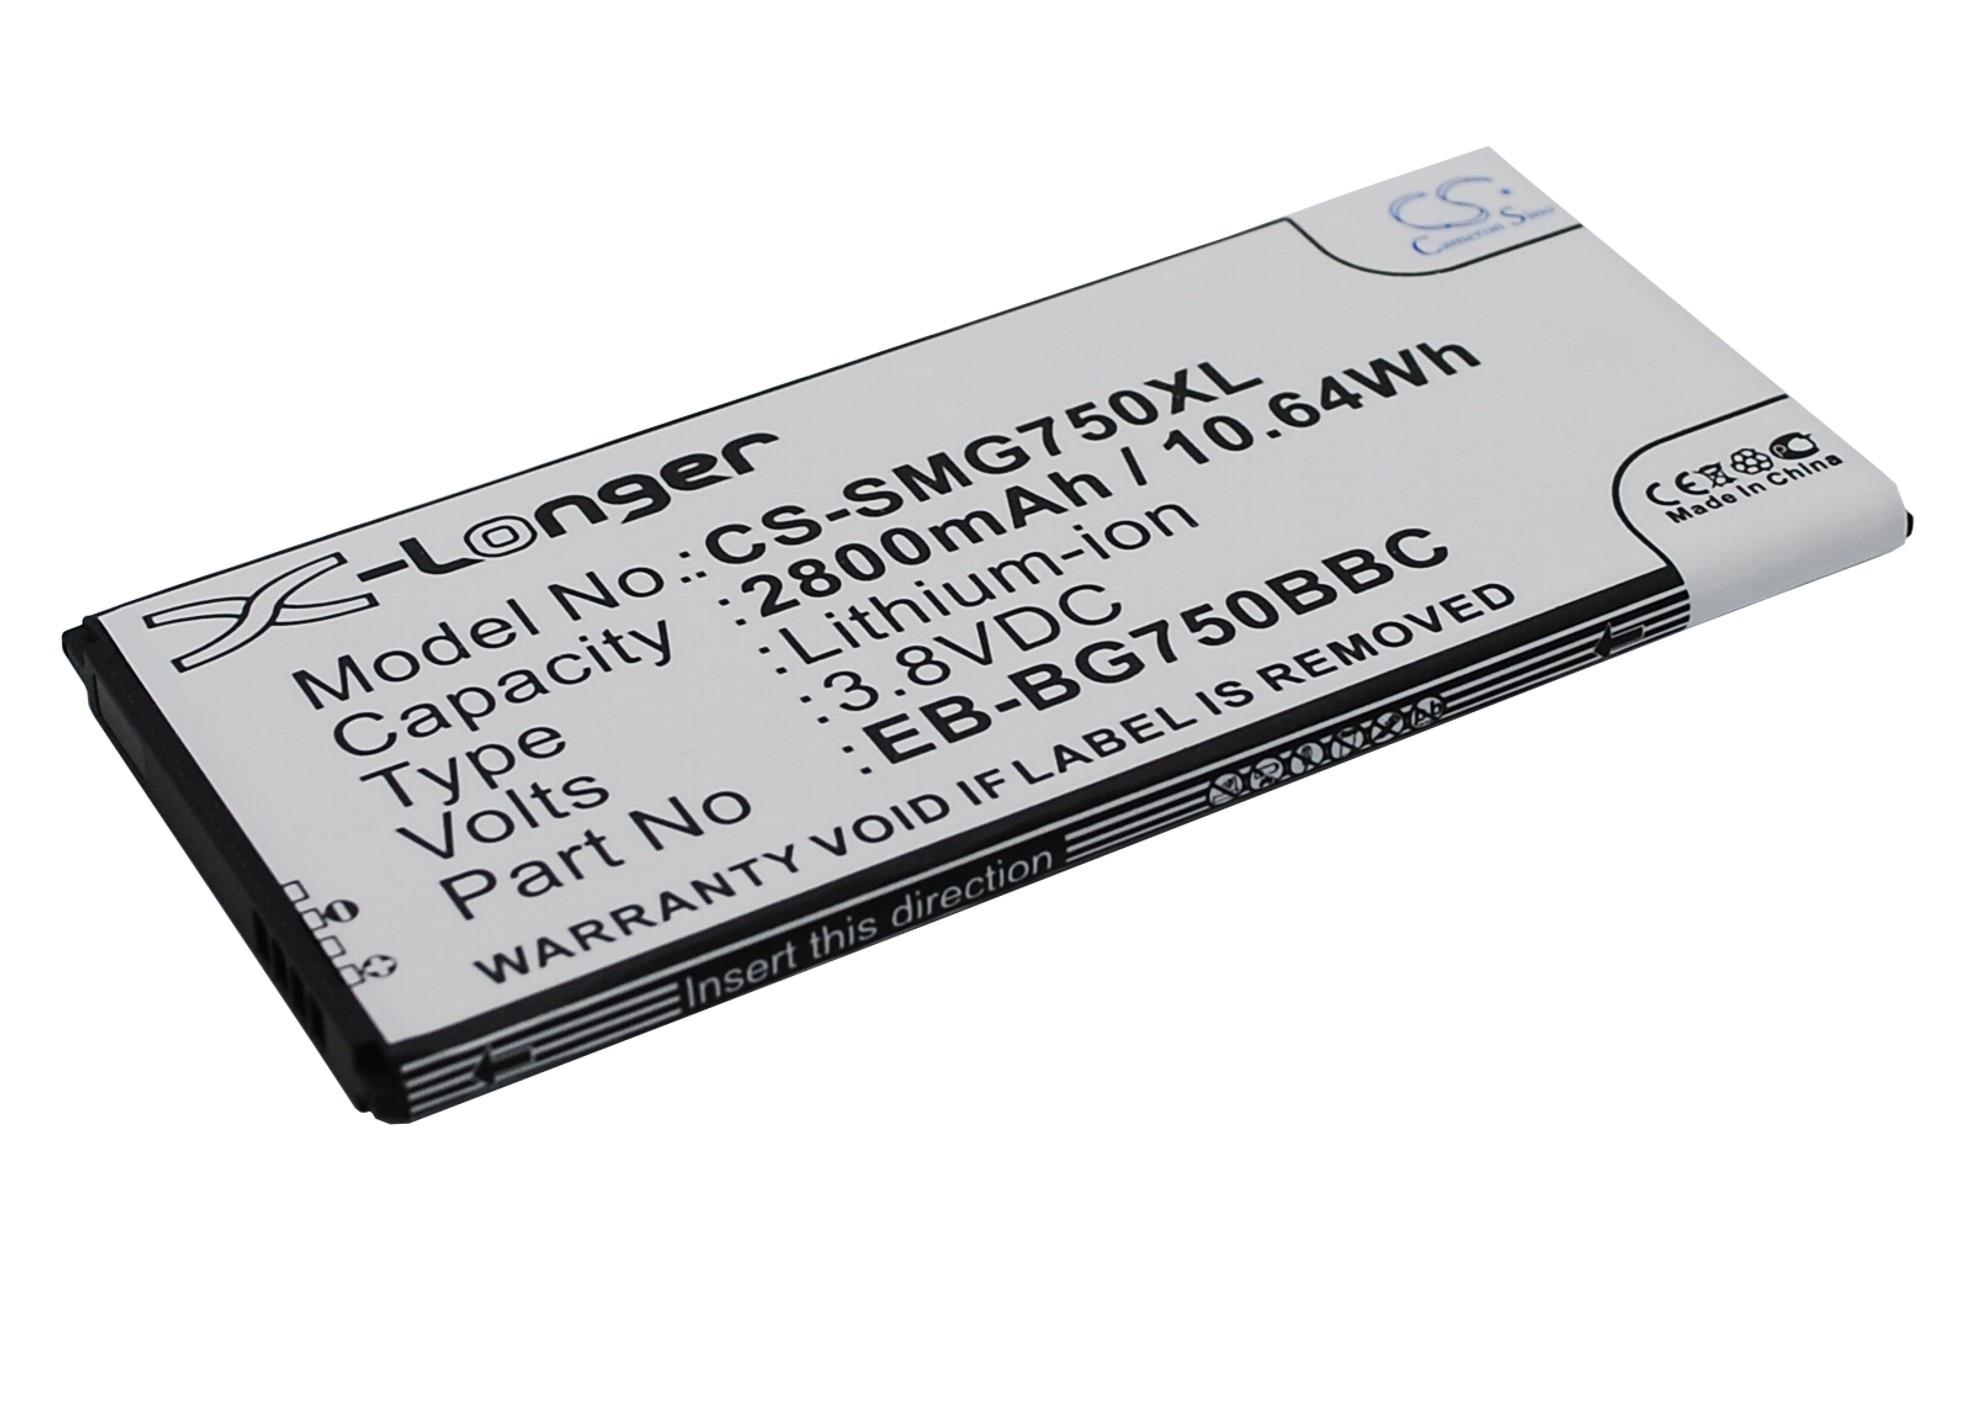 versandkostenfrei ex short 6 Shafts Aluminium GOLD 3,5 cm